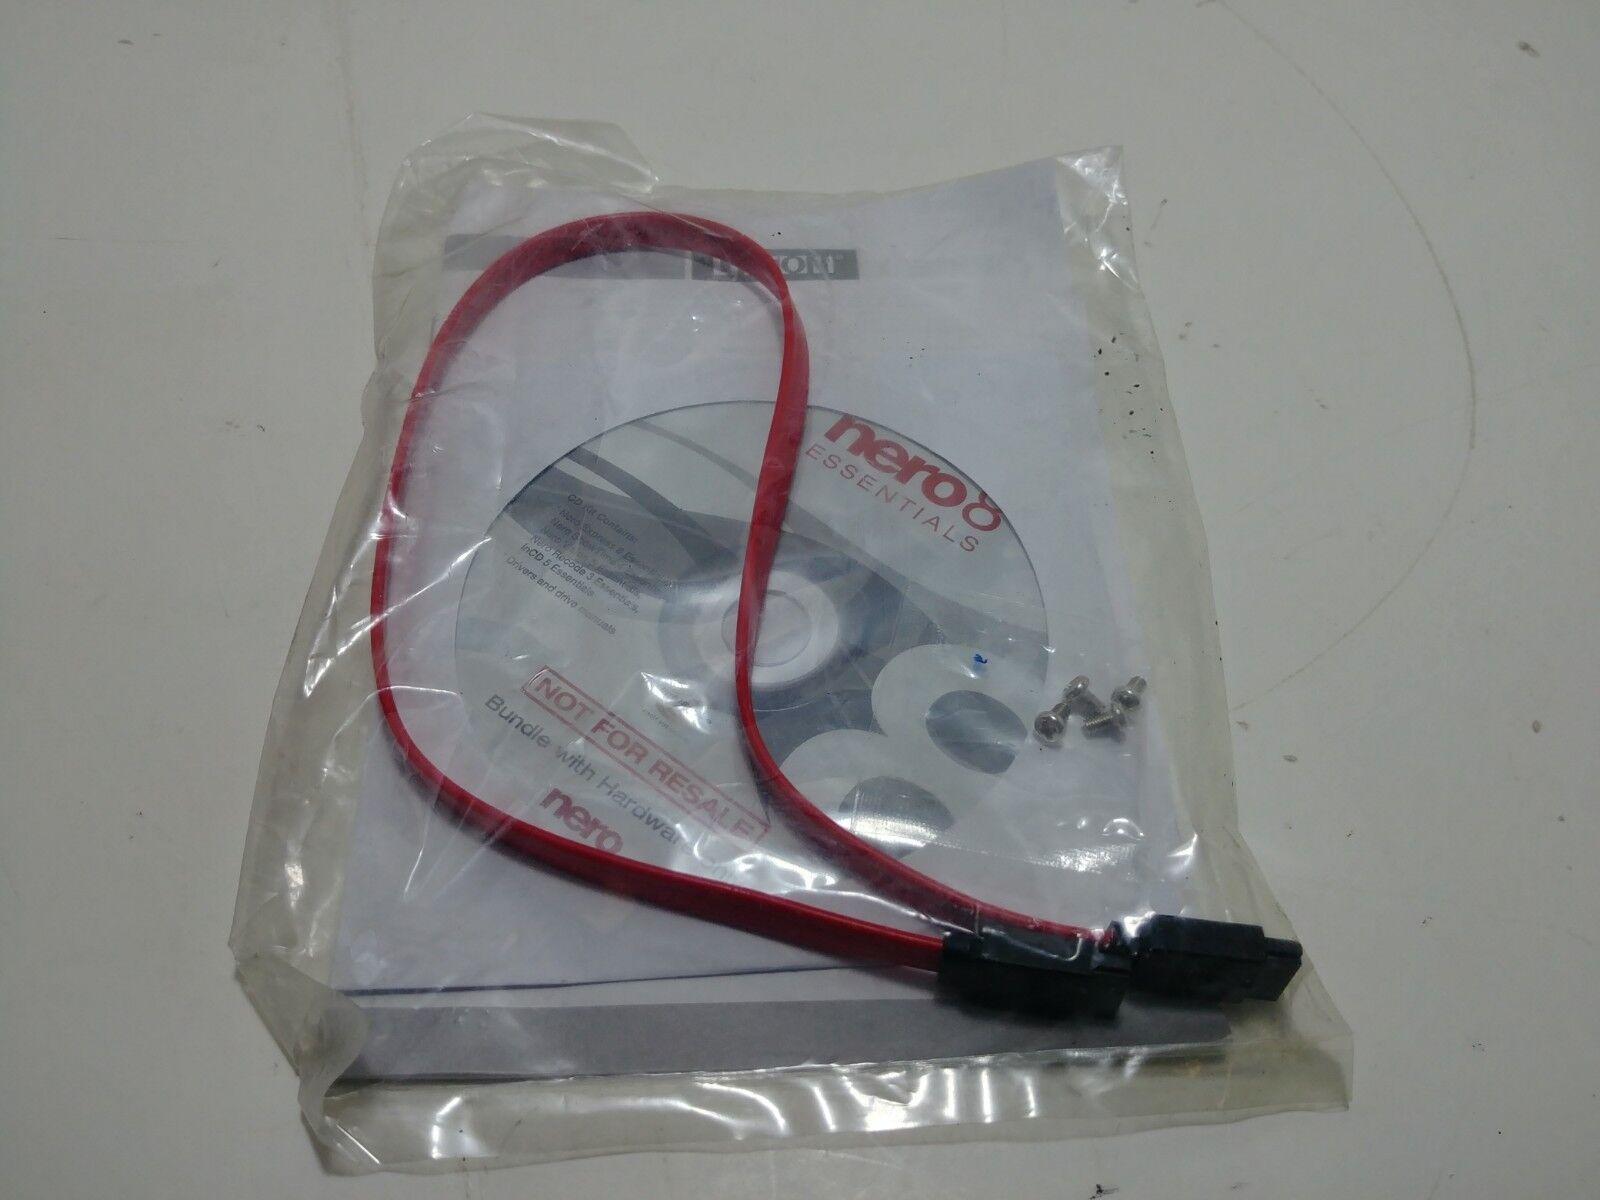 Nero 8 Essentials Hardware and Software Kit